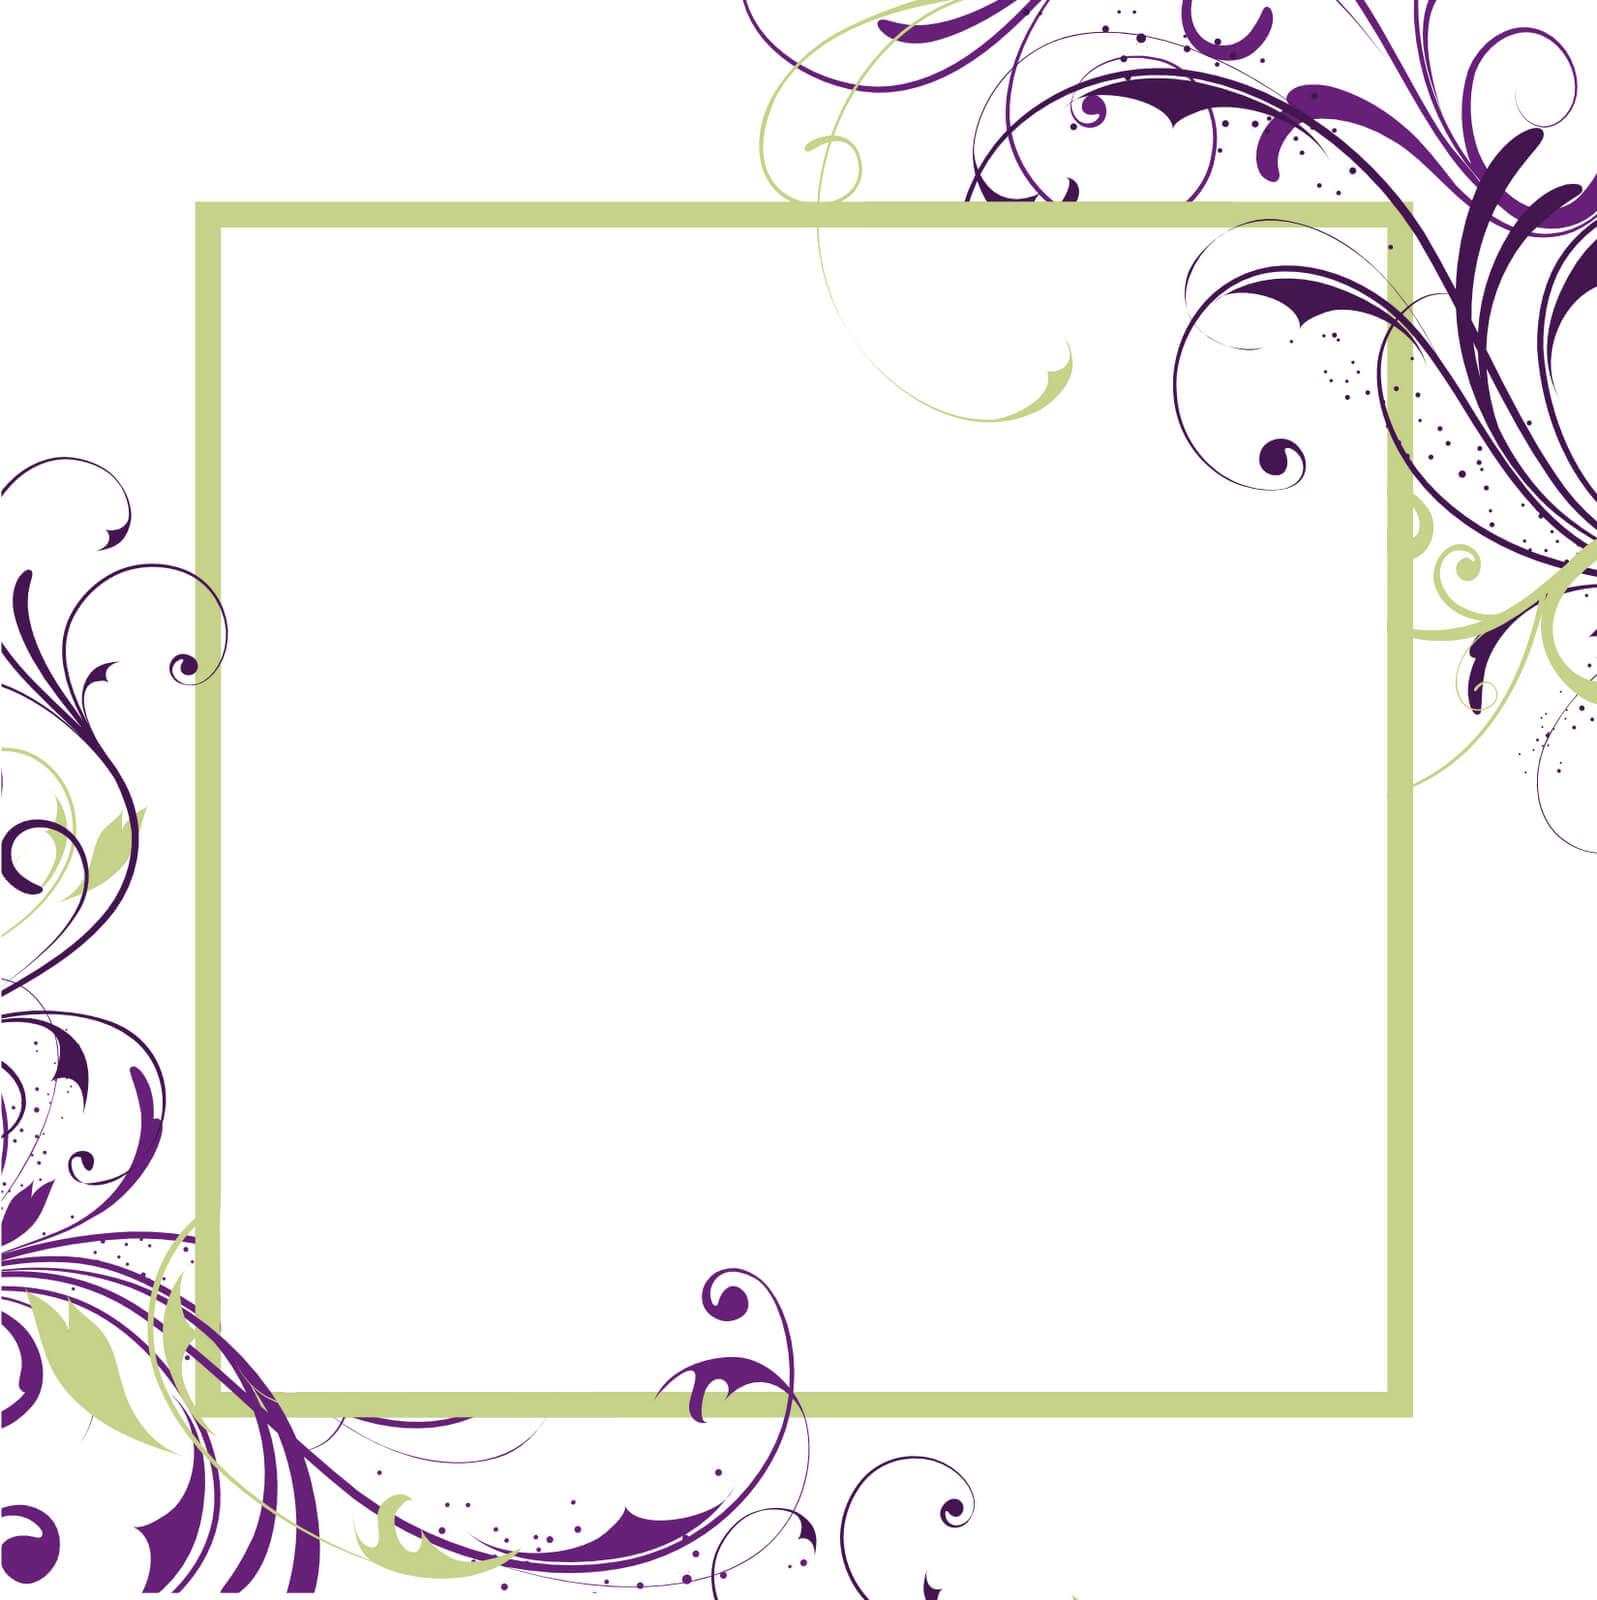 Free Printable Blank Invitations Templates | Blank Wedding With Blank Templates For Invitations